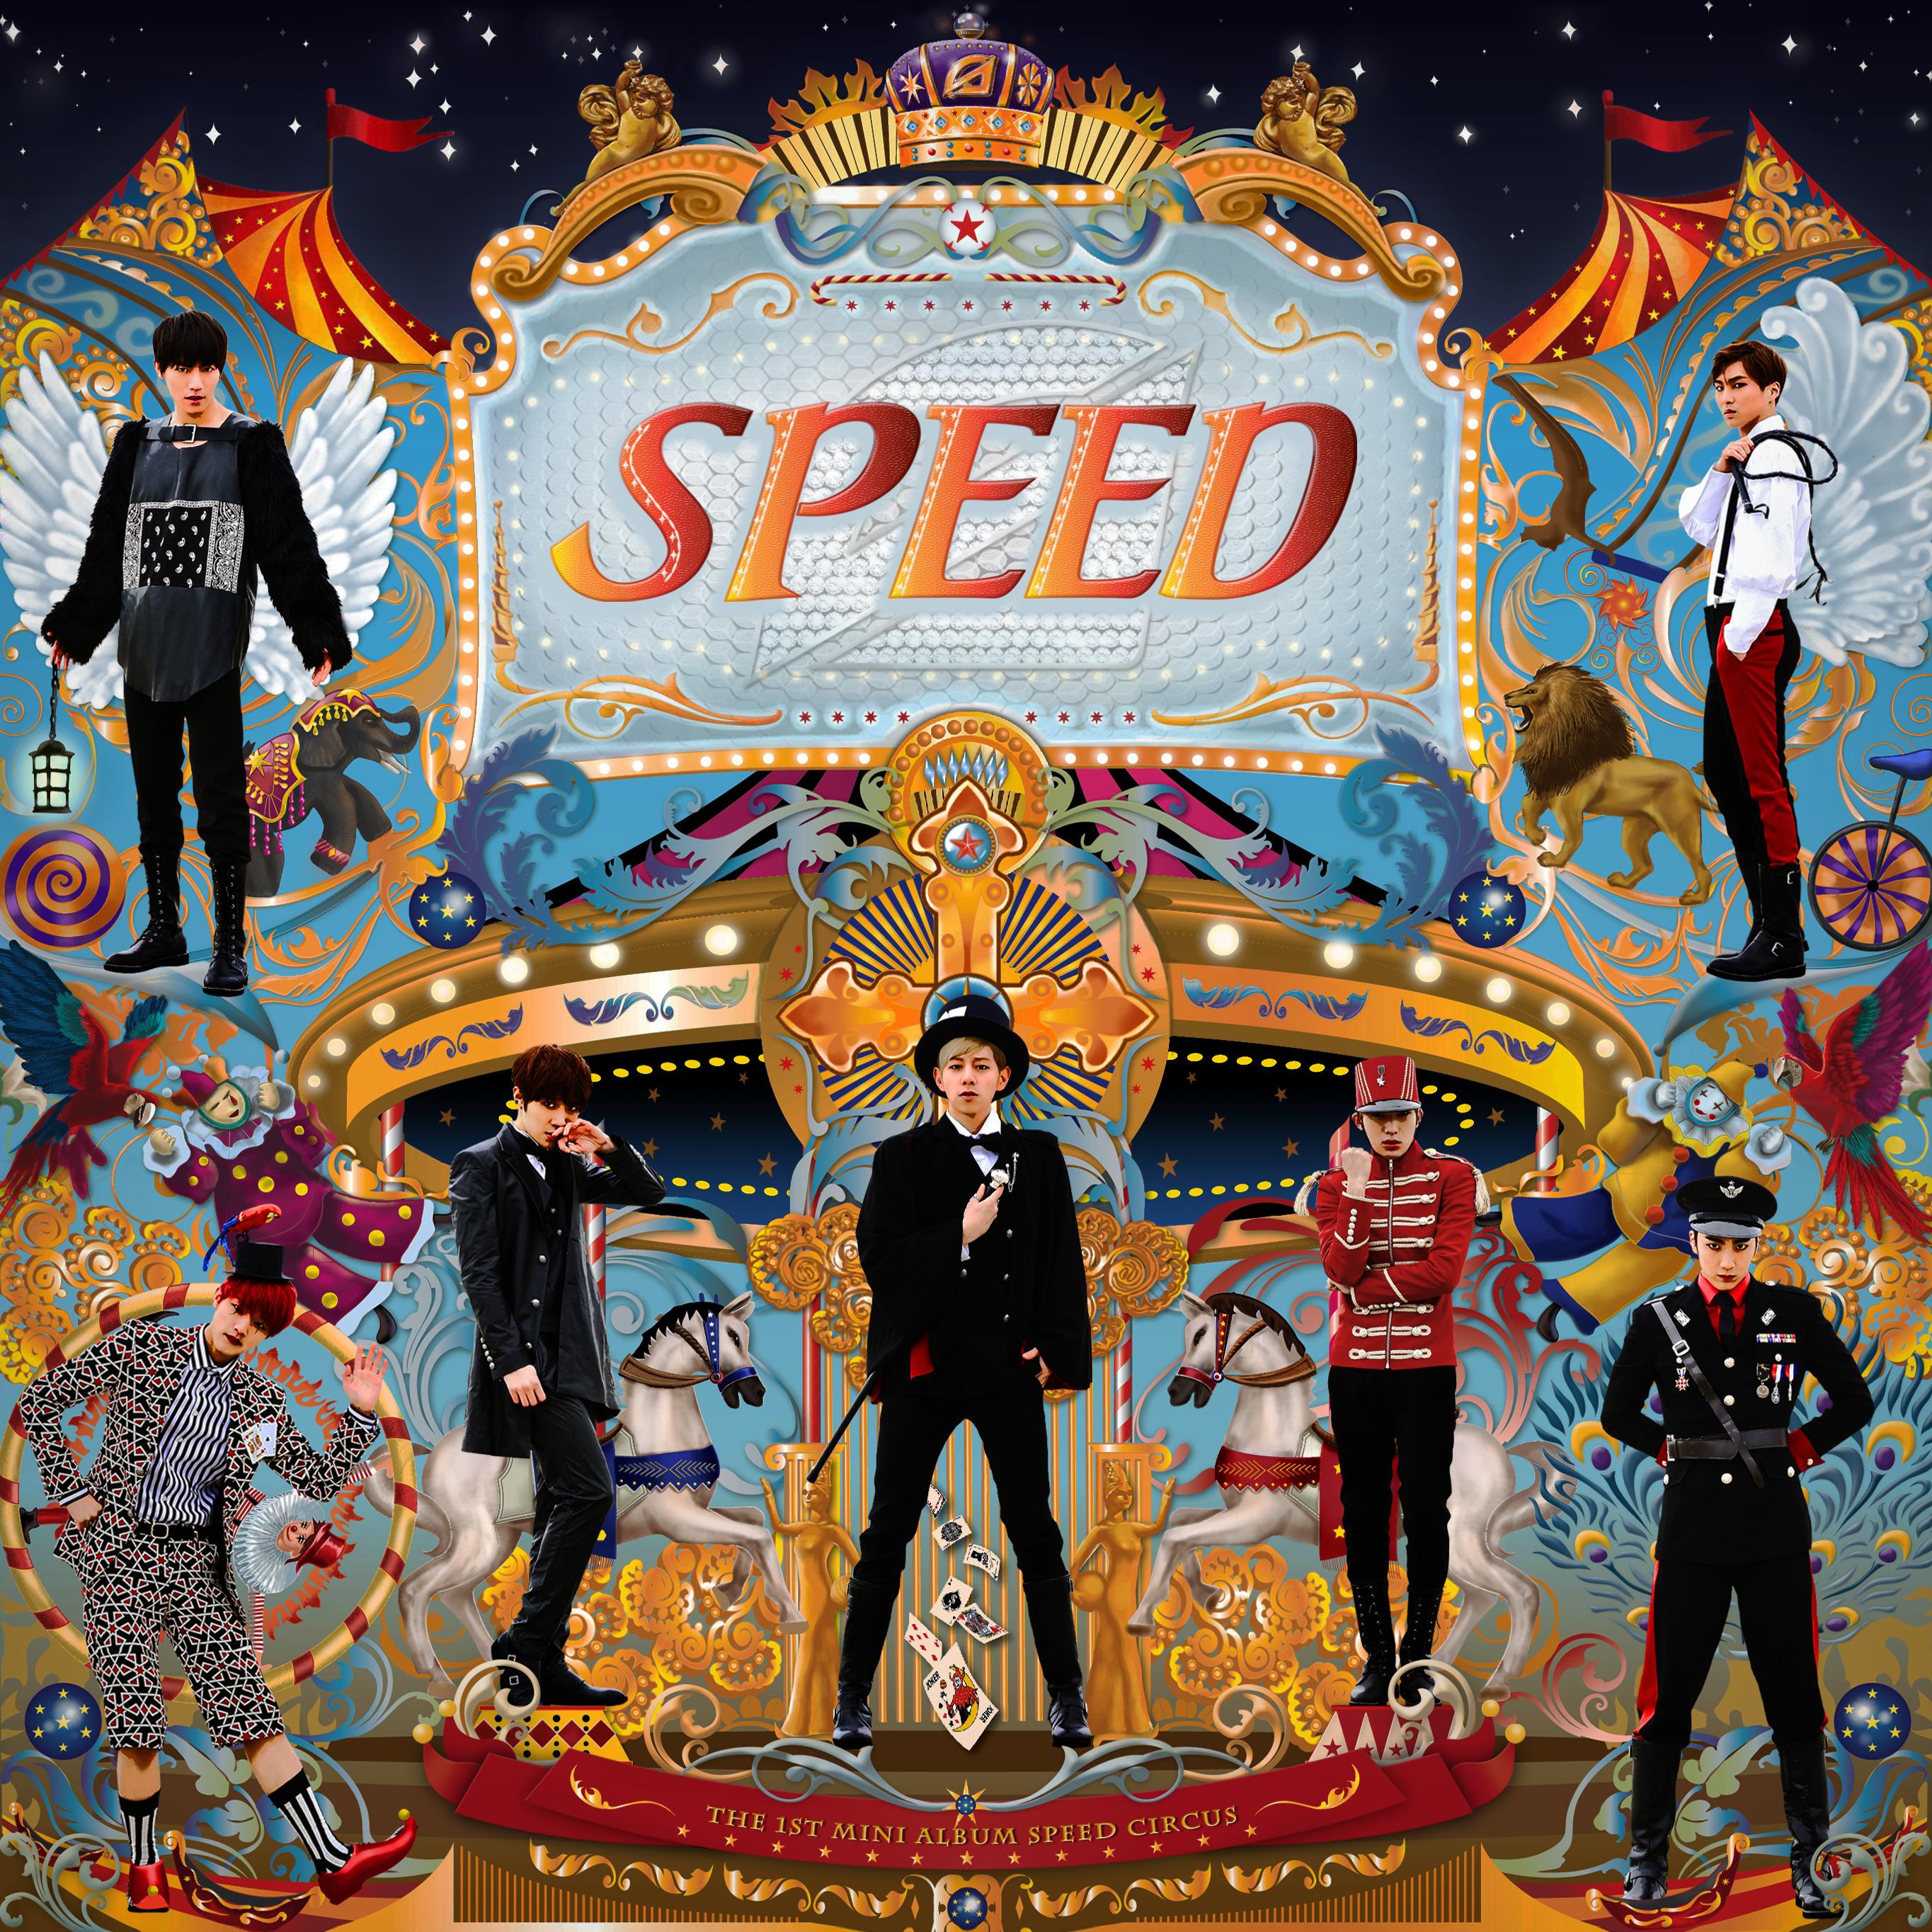 SPEED - Speed Circus